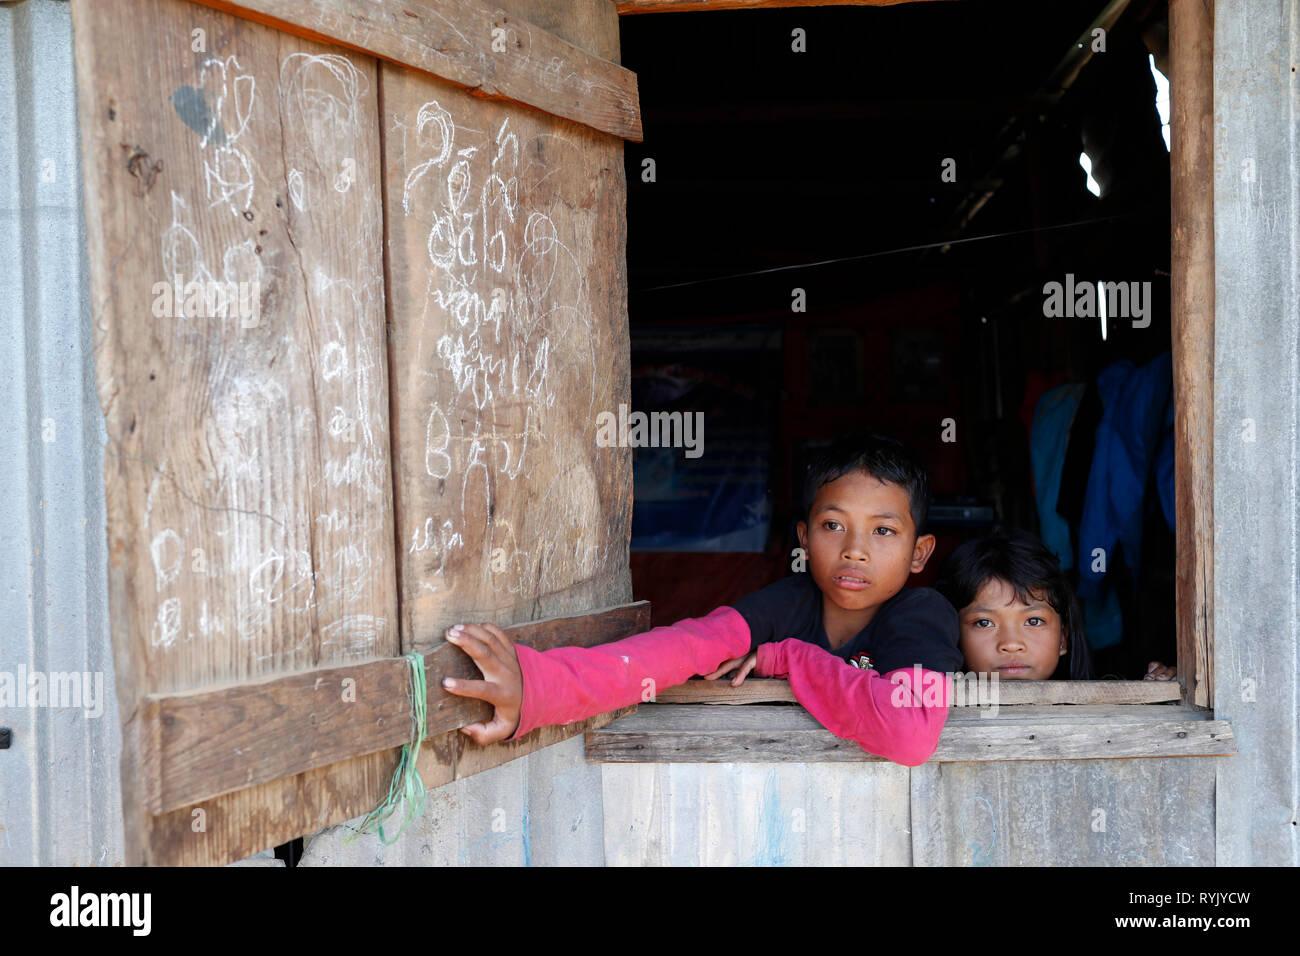 Poor vietnamese family living in a small barrack consists of scrap metal. Dalat. Vietnam. - Stock Image